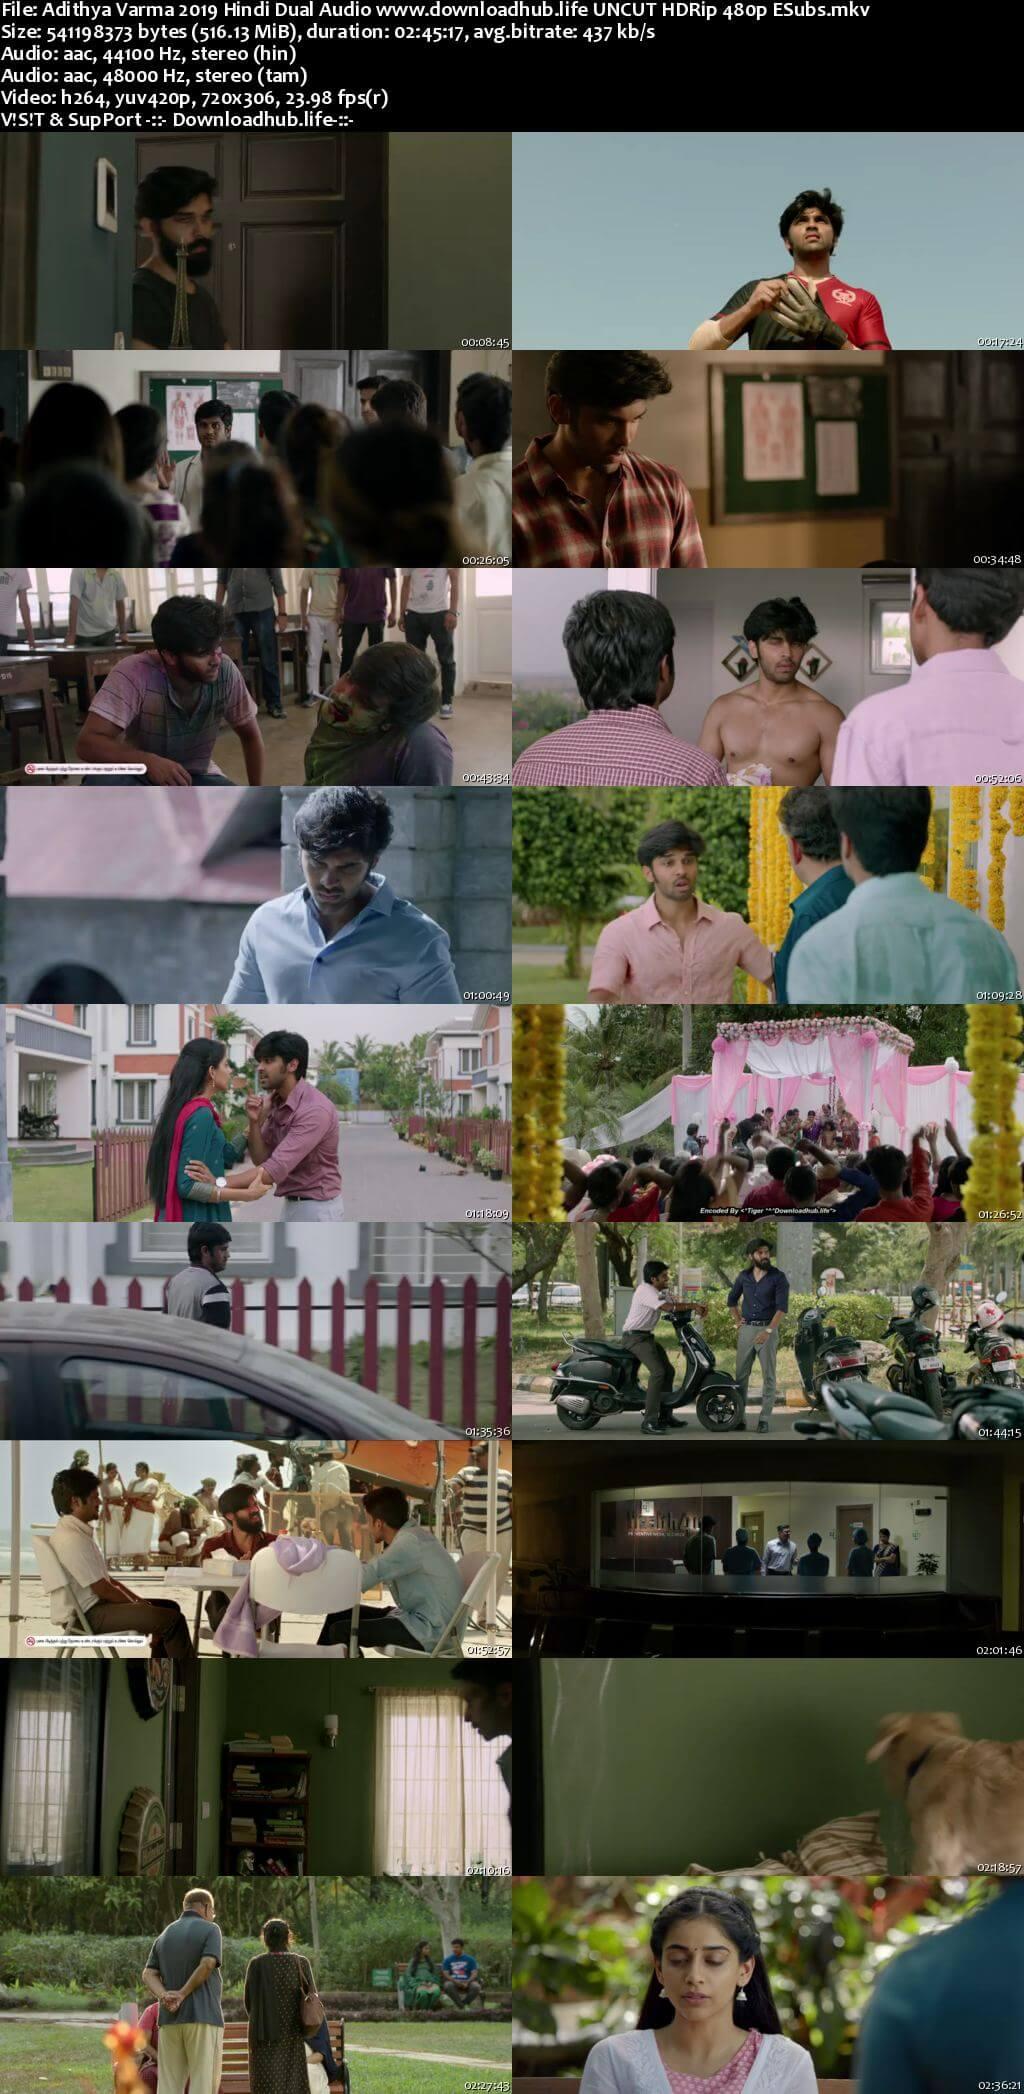 Adithya Varma 2019 Hindi Dual Audio 500MB UNCUT HDRip 480p ESubs